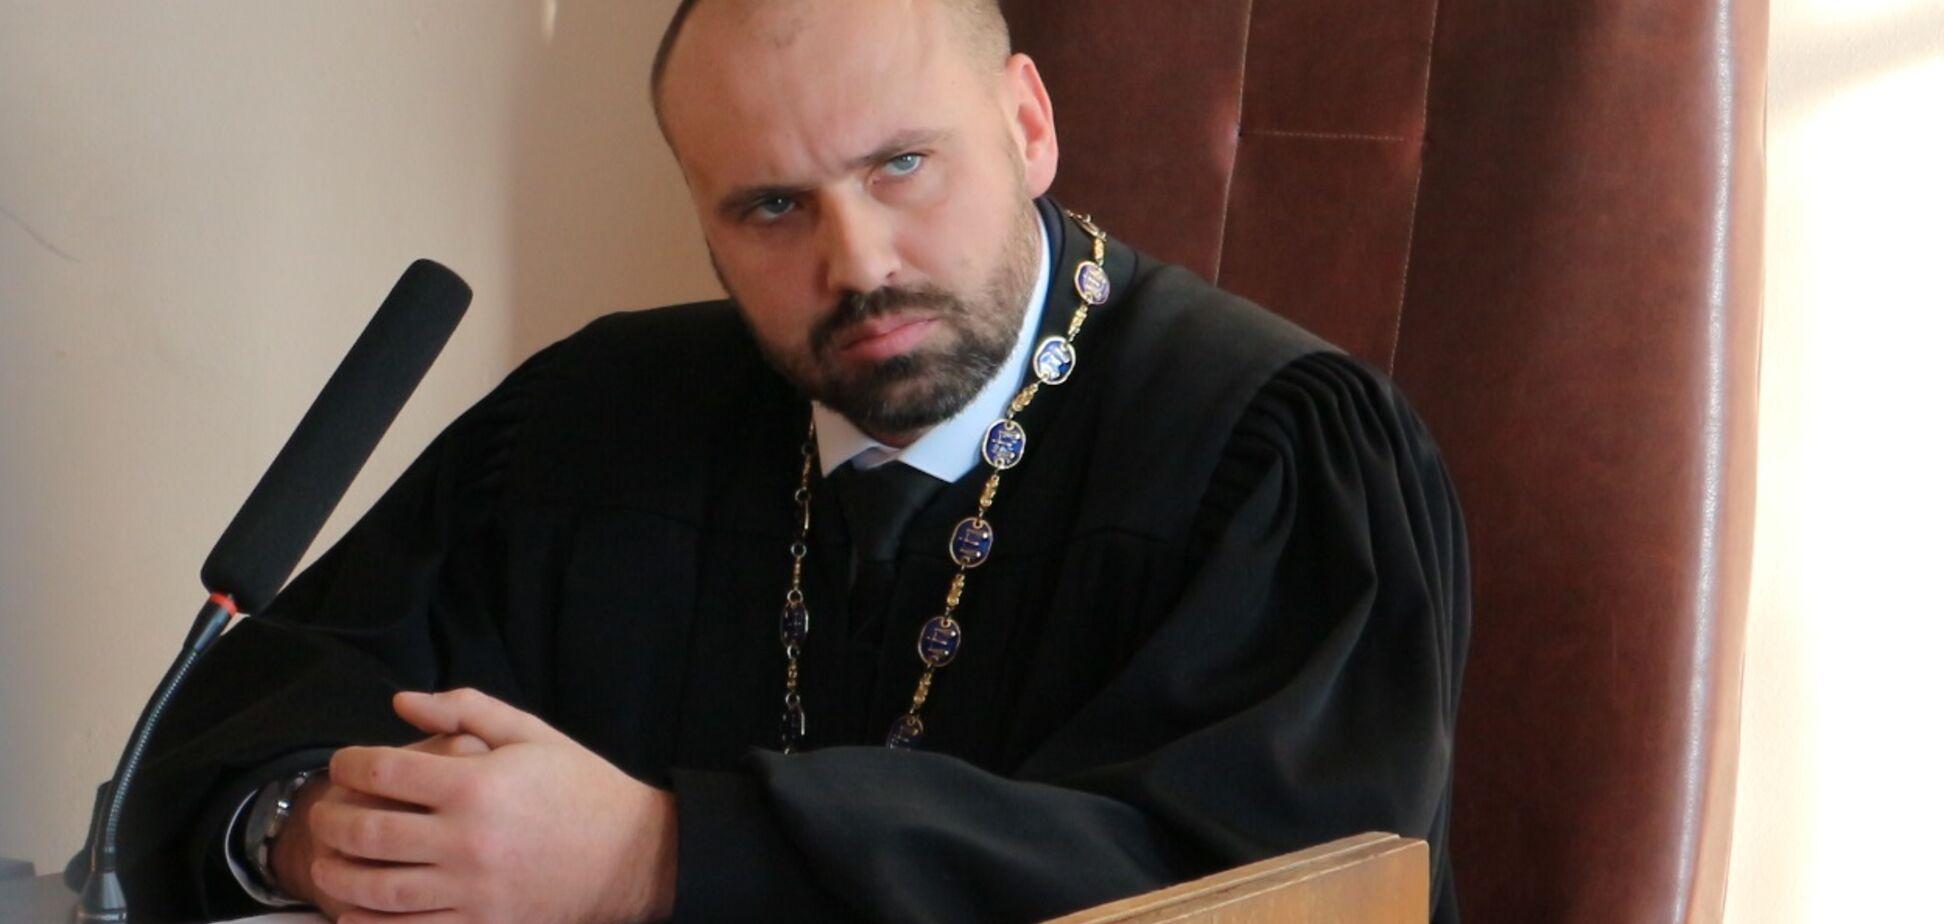 Названа причина смерти судьи Бобровника